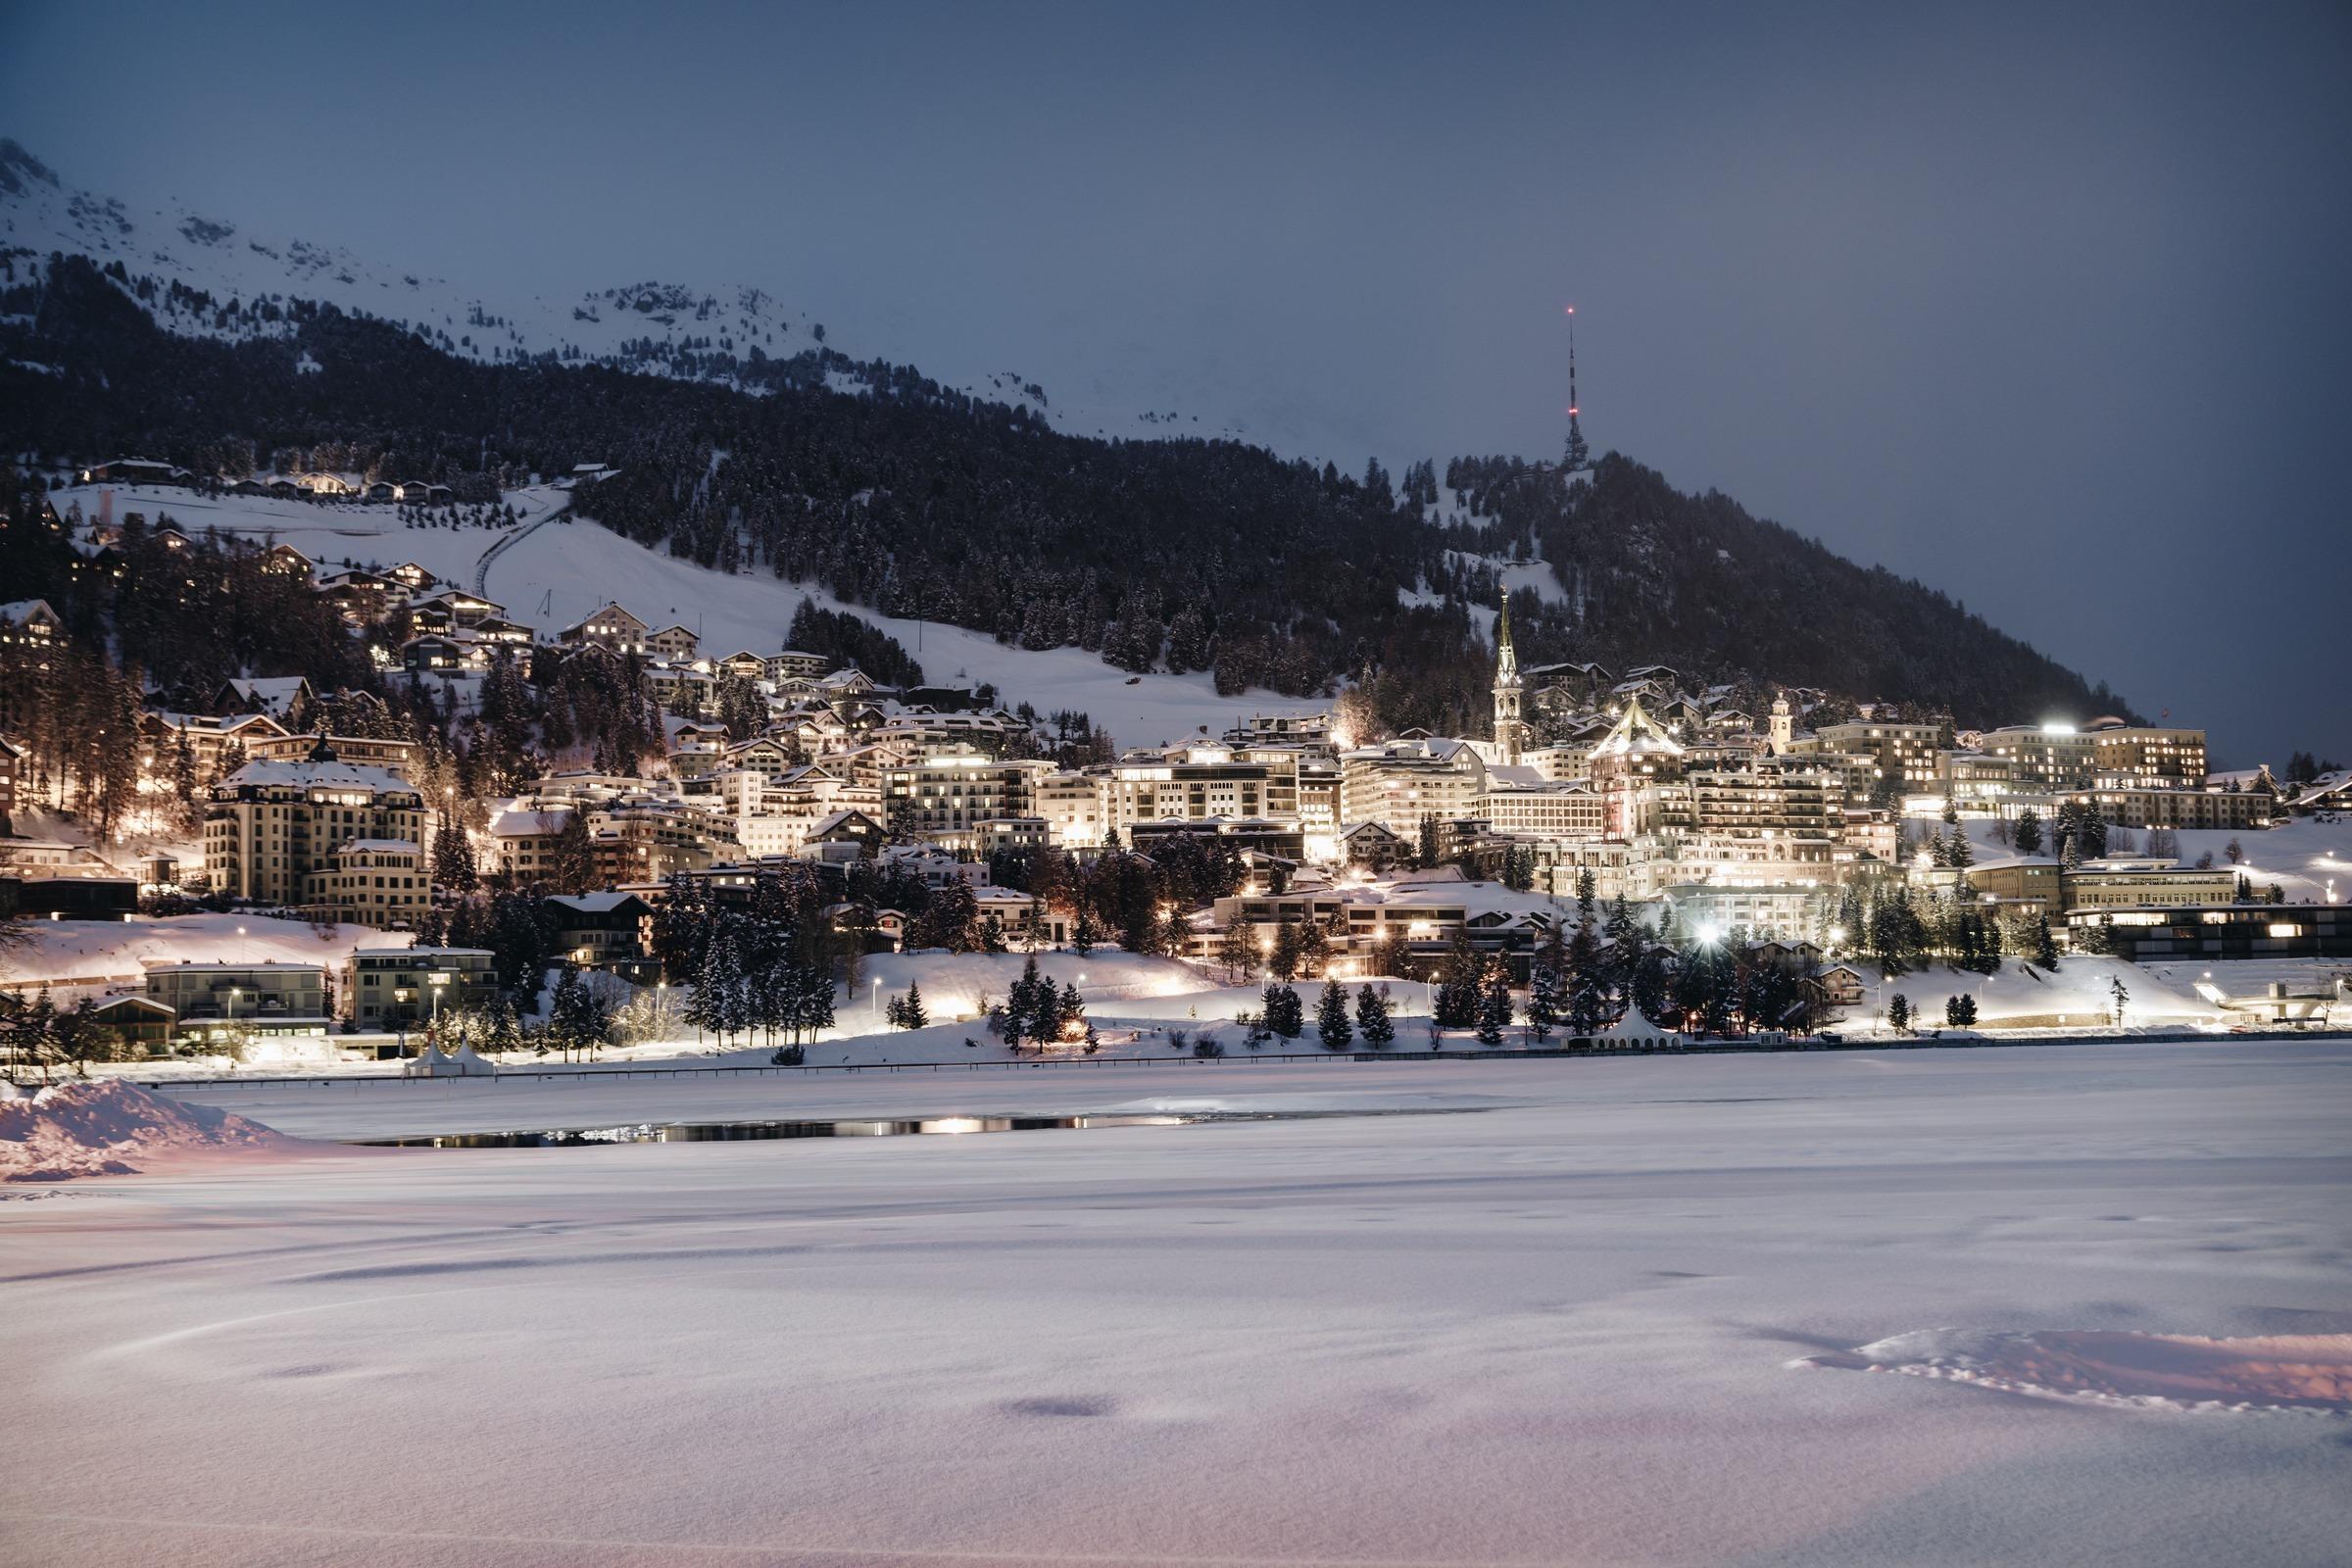 Village tour of St. Moritz